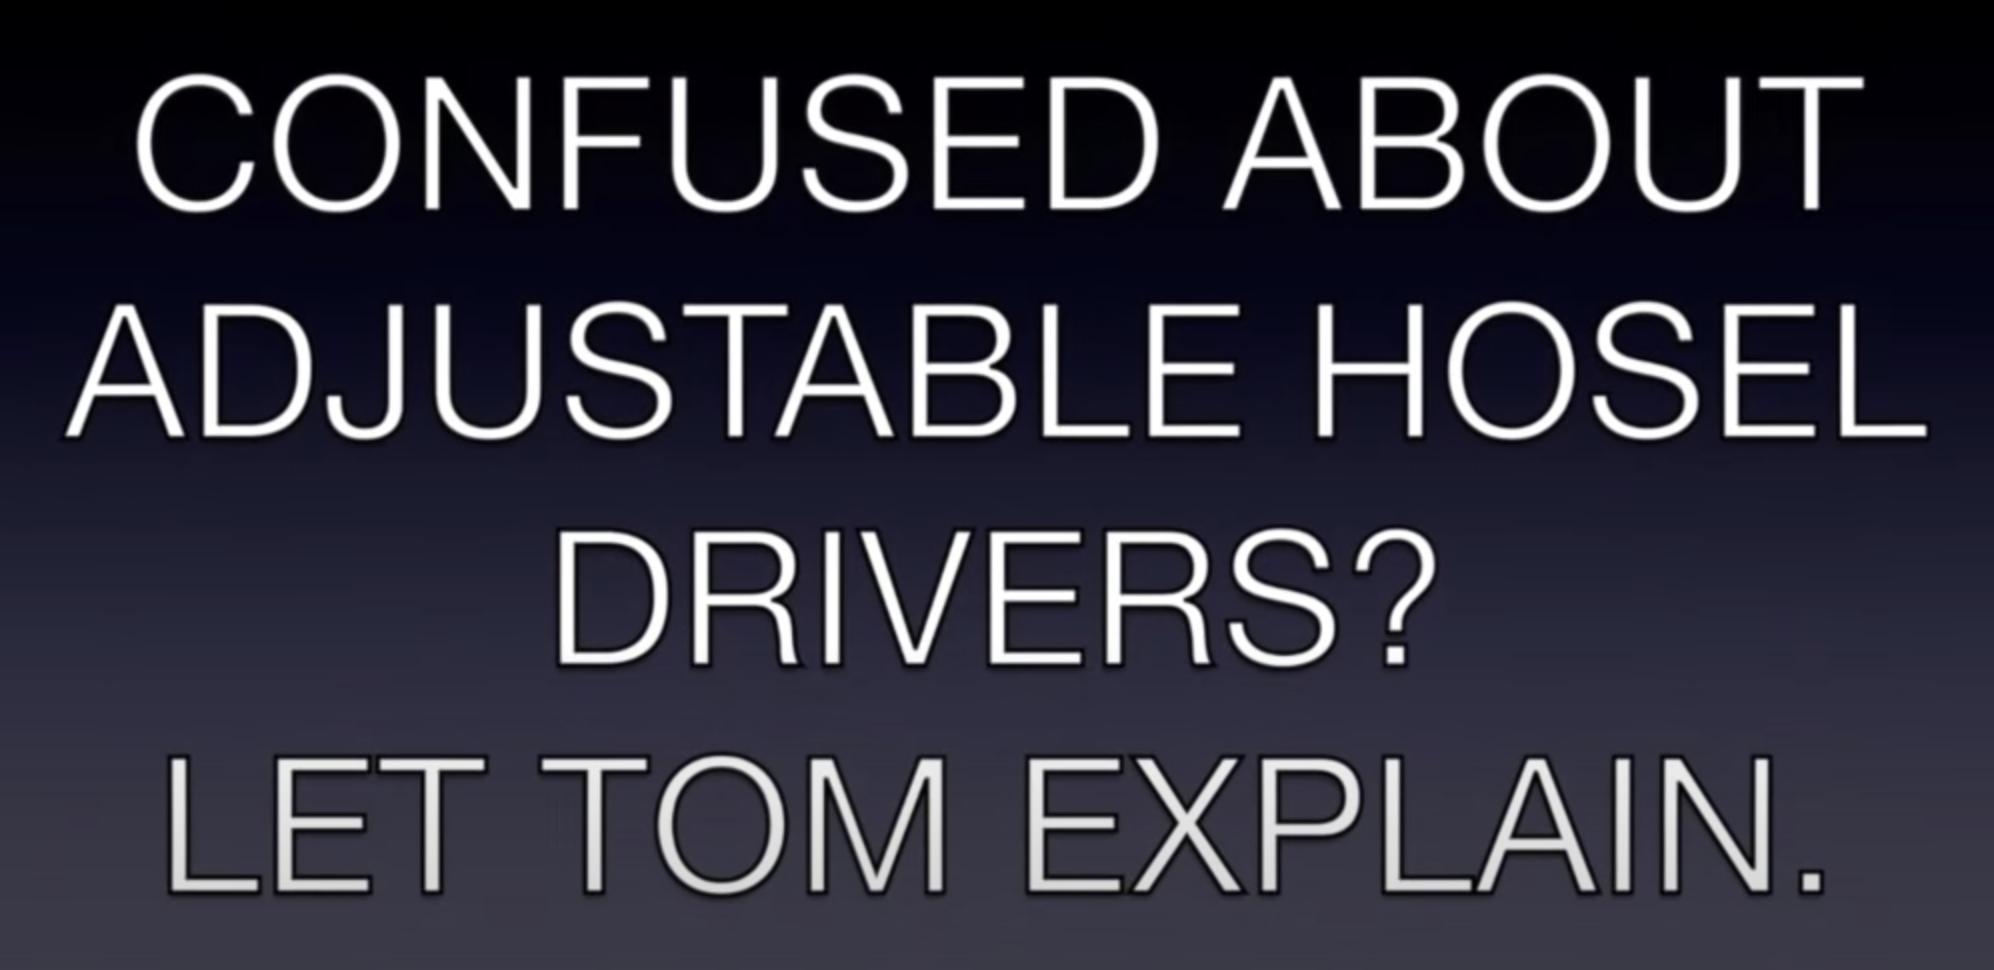 adjustable Hosels